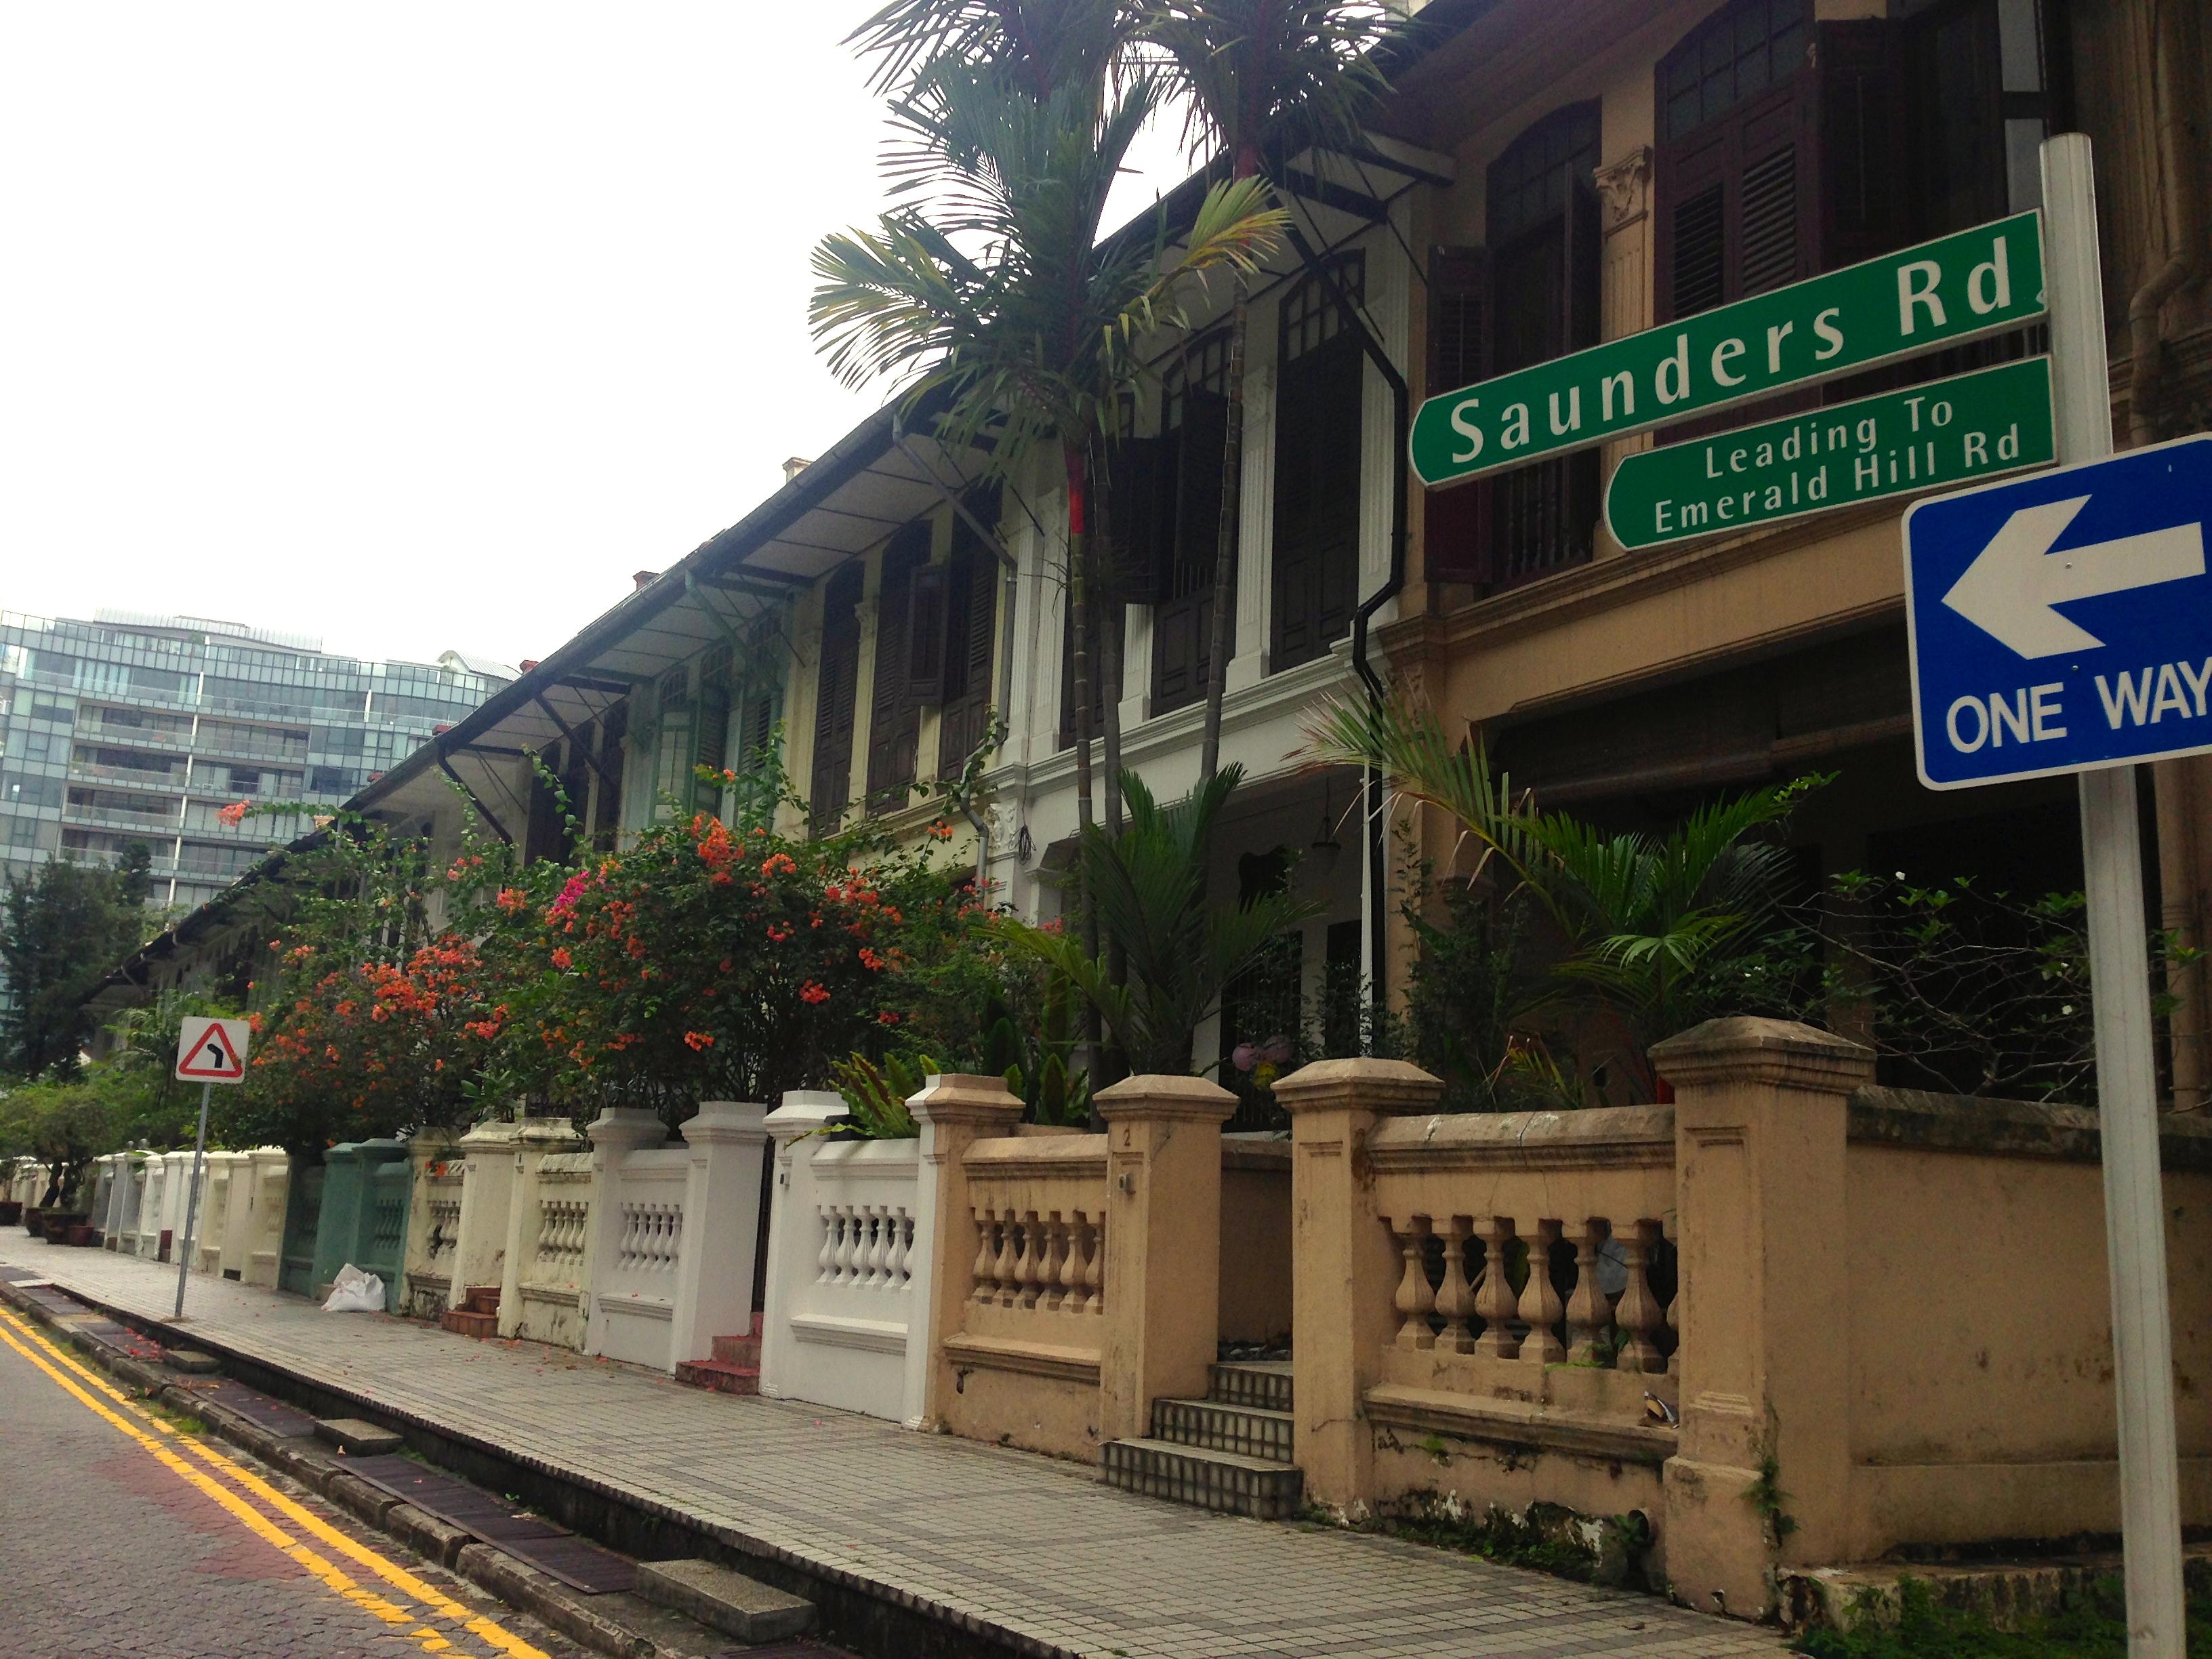 「saunders road singapore」の画像検索結果